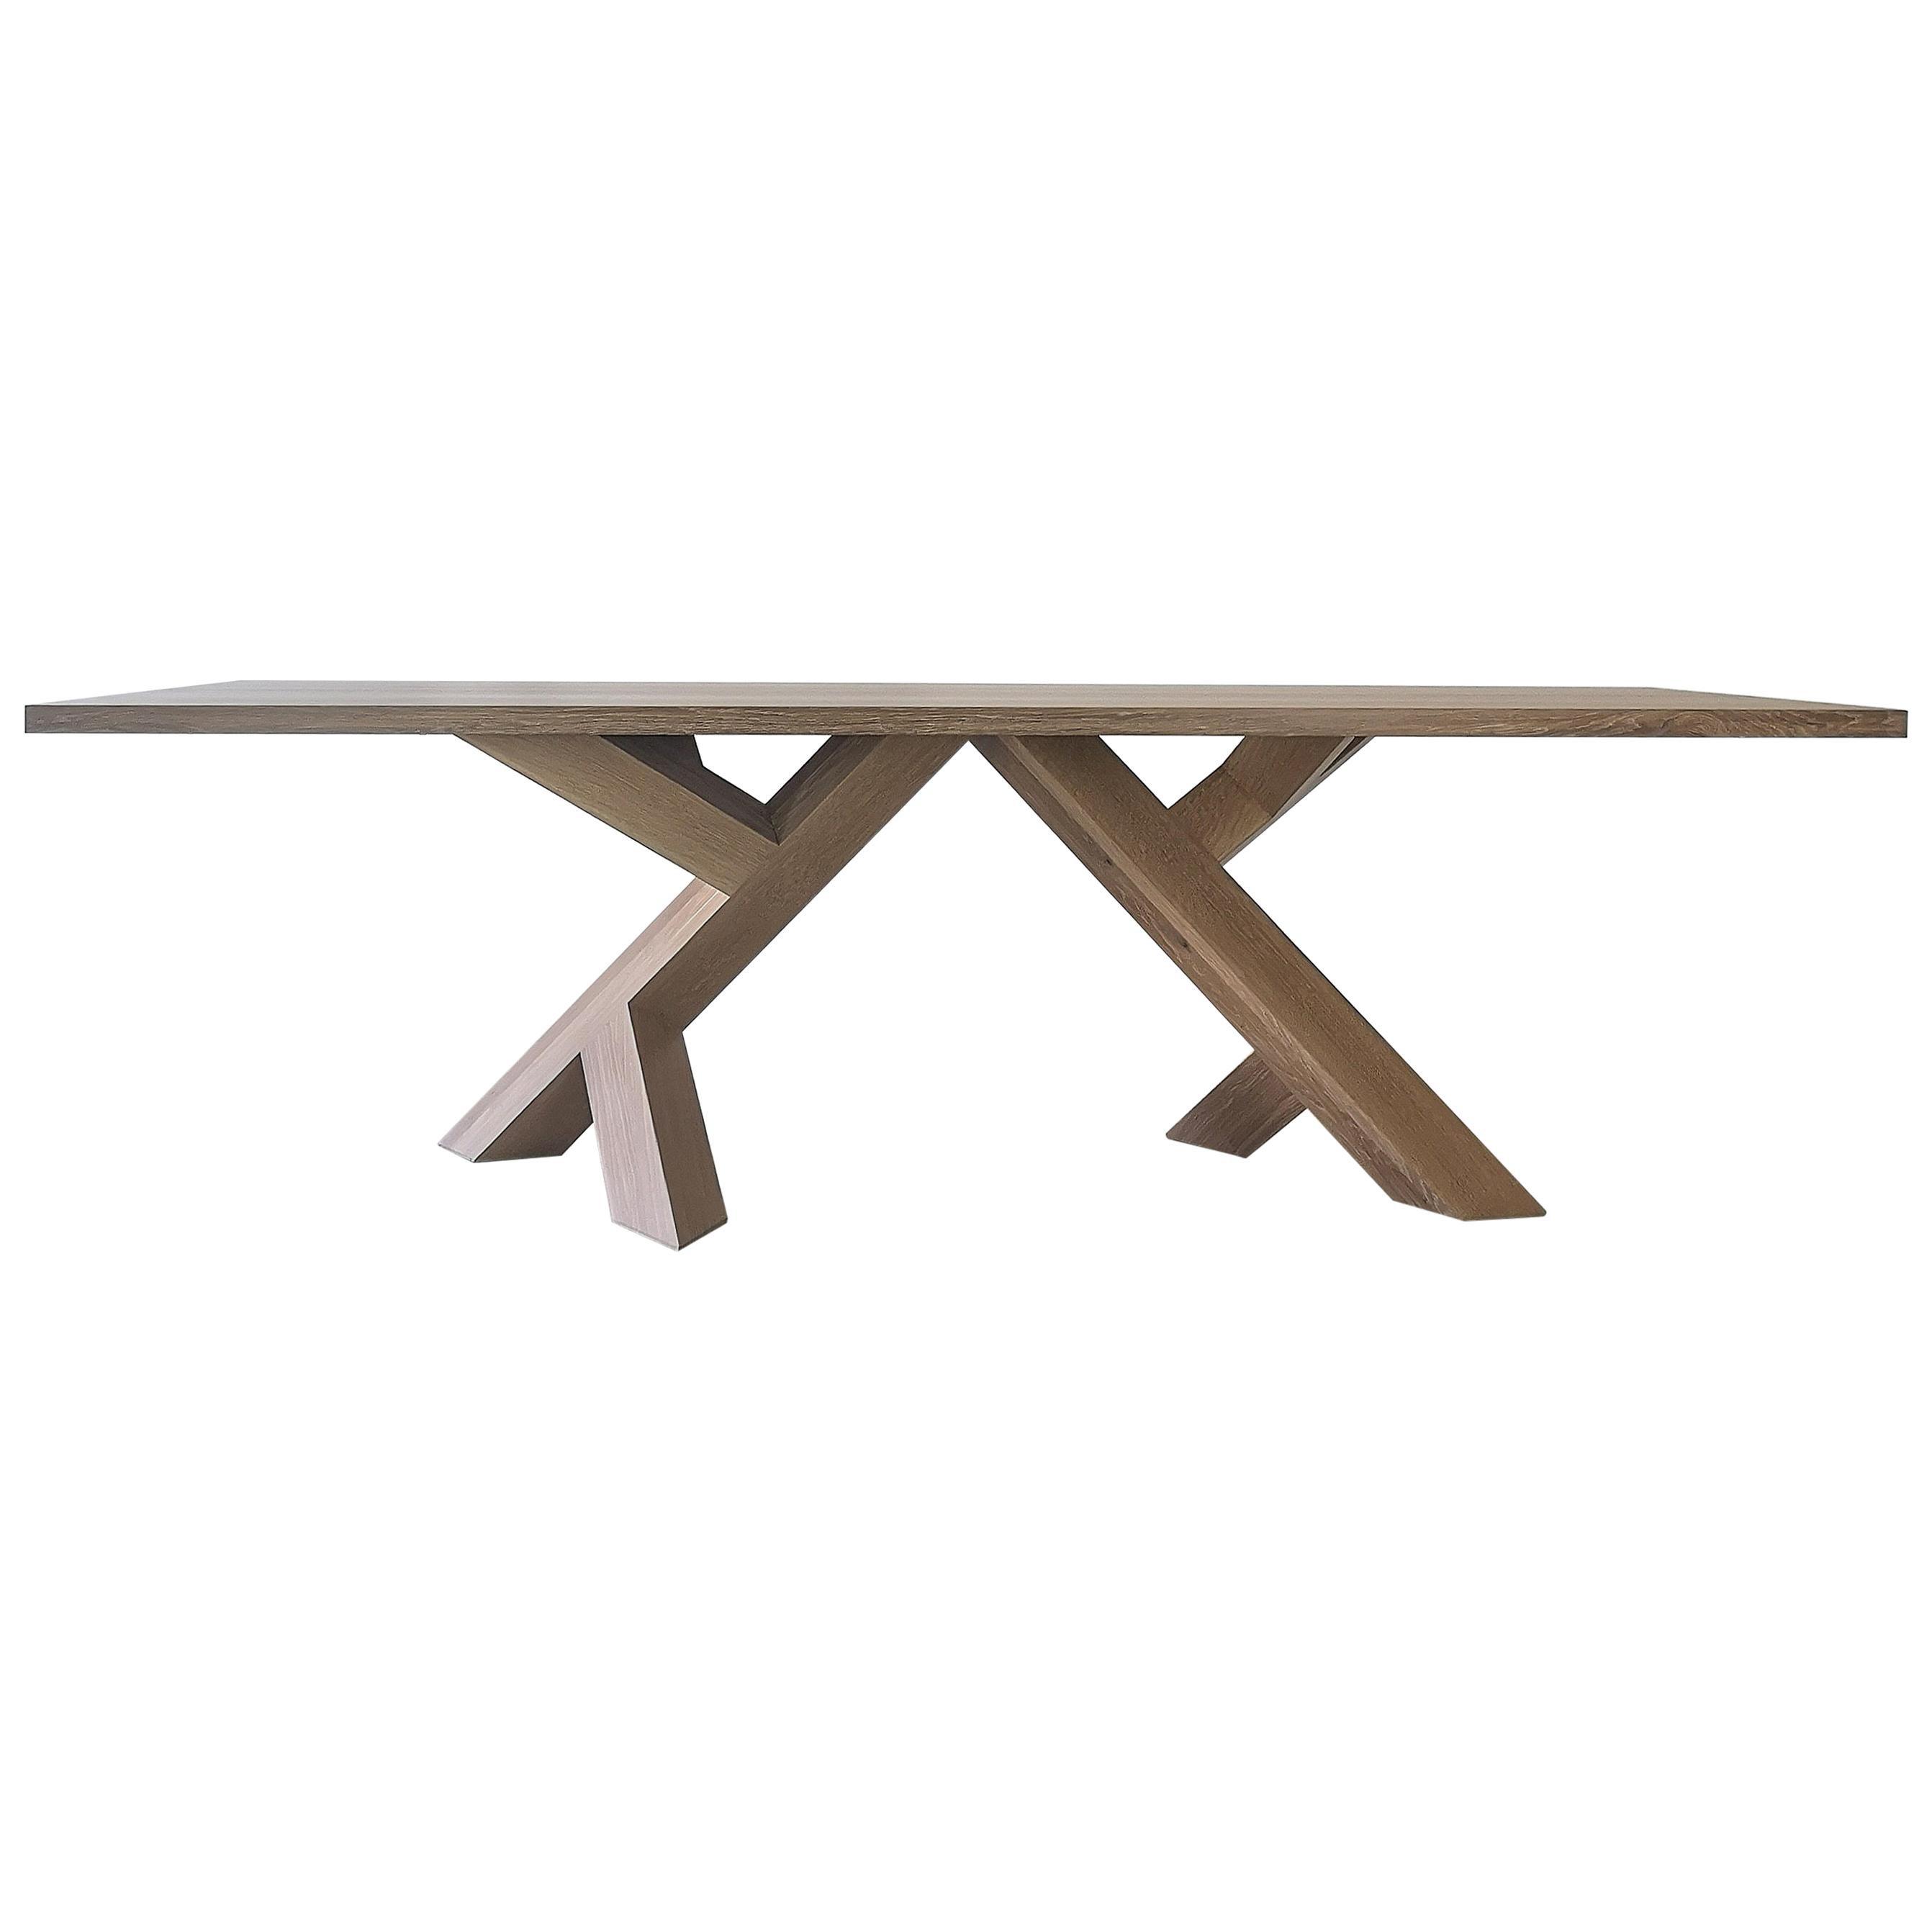 Iconoclast Modern Hardwood Dining Table by Izm Design